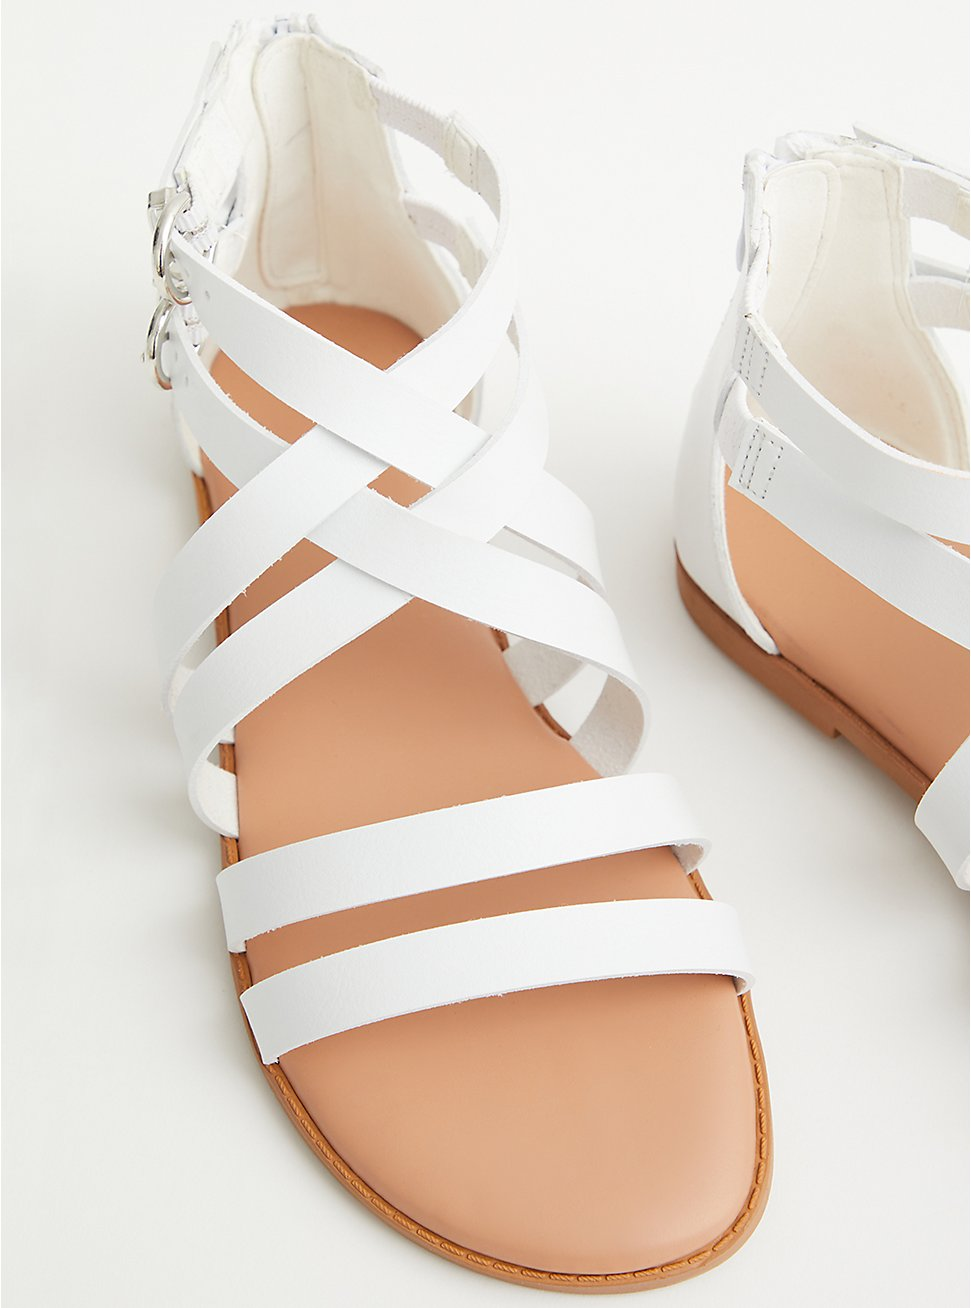 White Faux Leather Strappy Gladiator Sandal, WHITE, hi-res